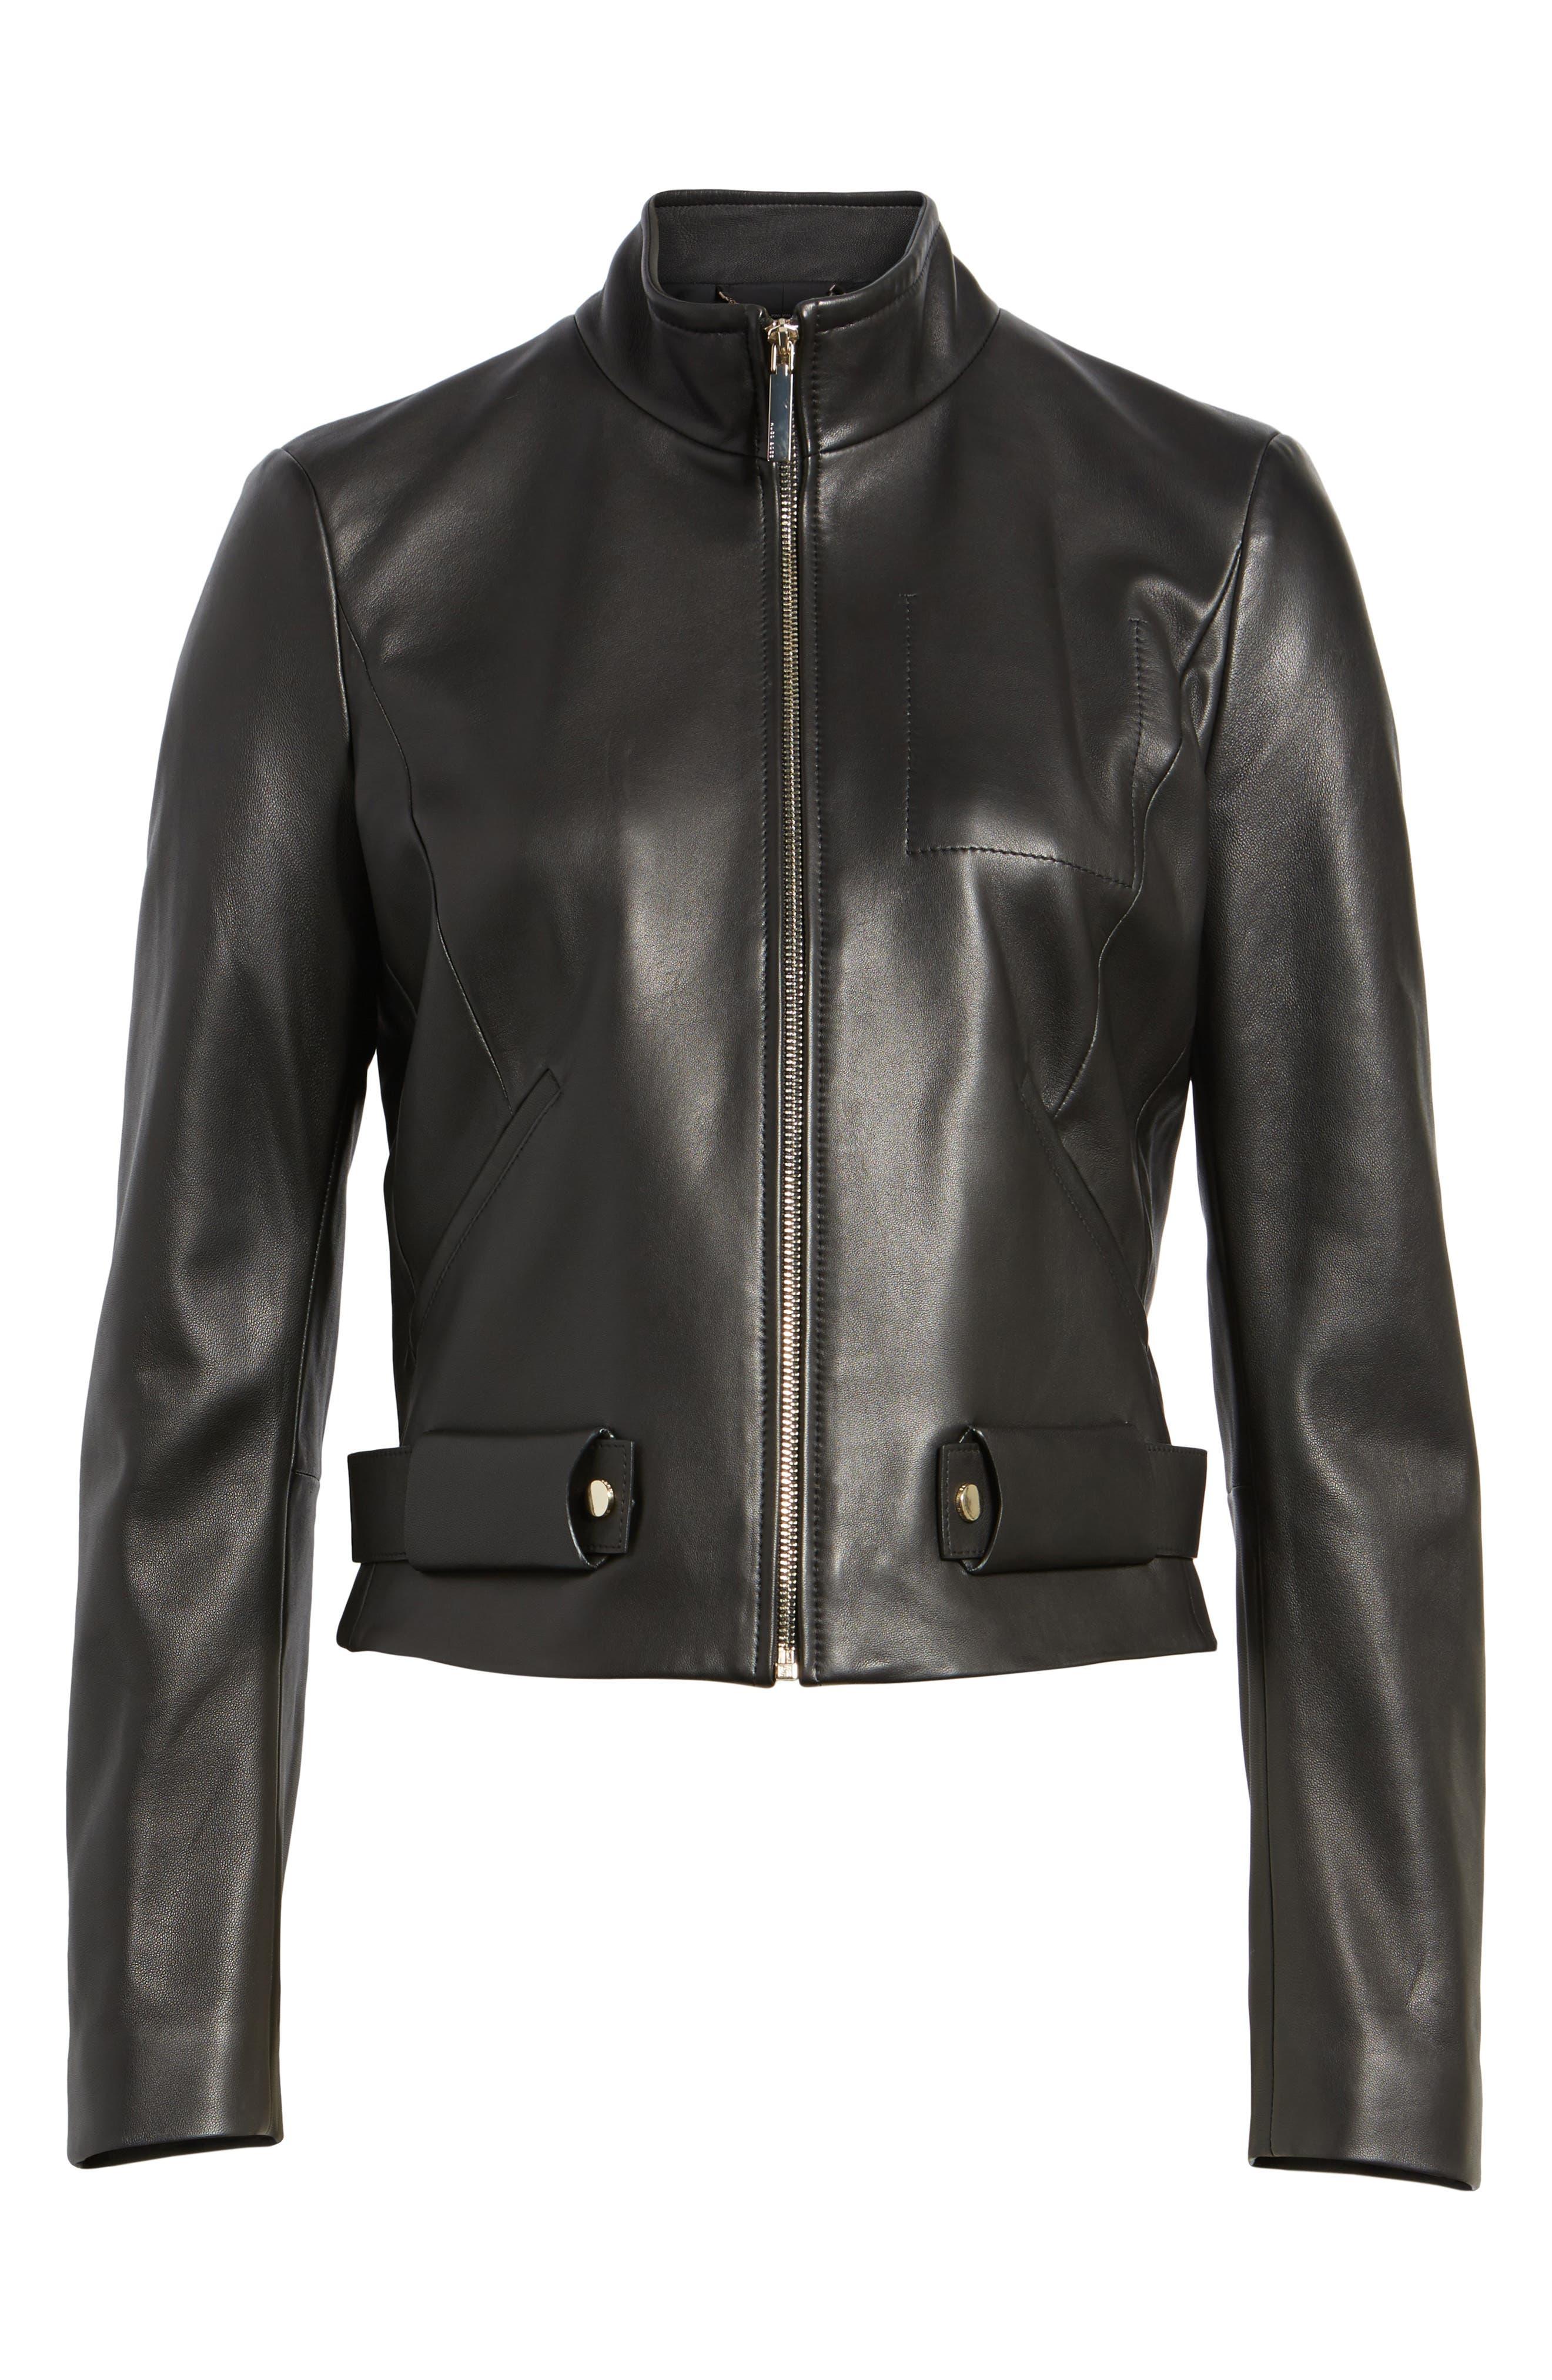 Sanuvo Leather Jacket,                             Alternate thumbnail 6, color,                             Black